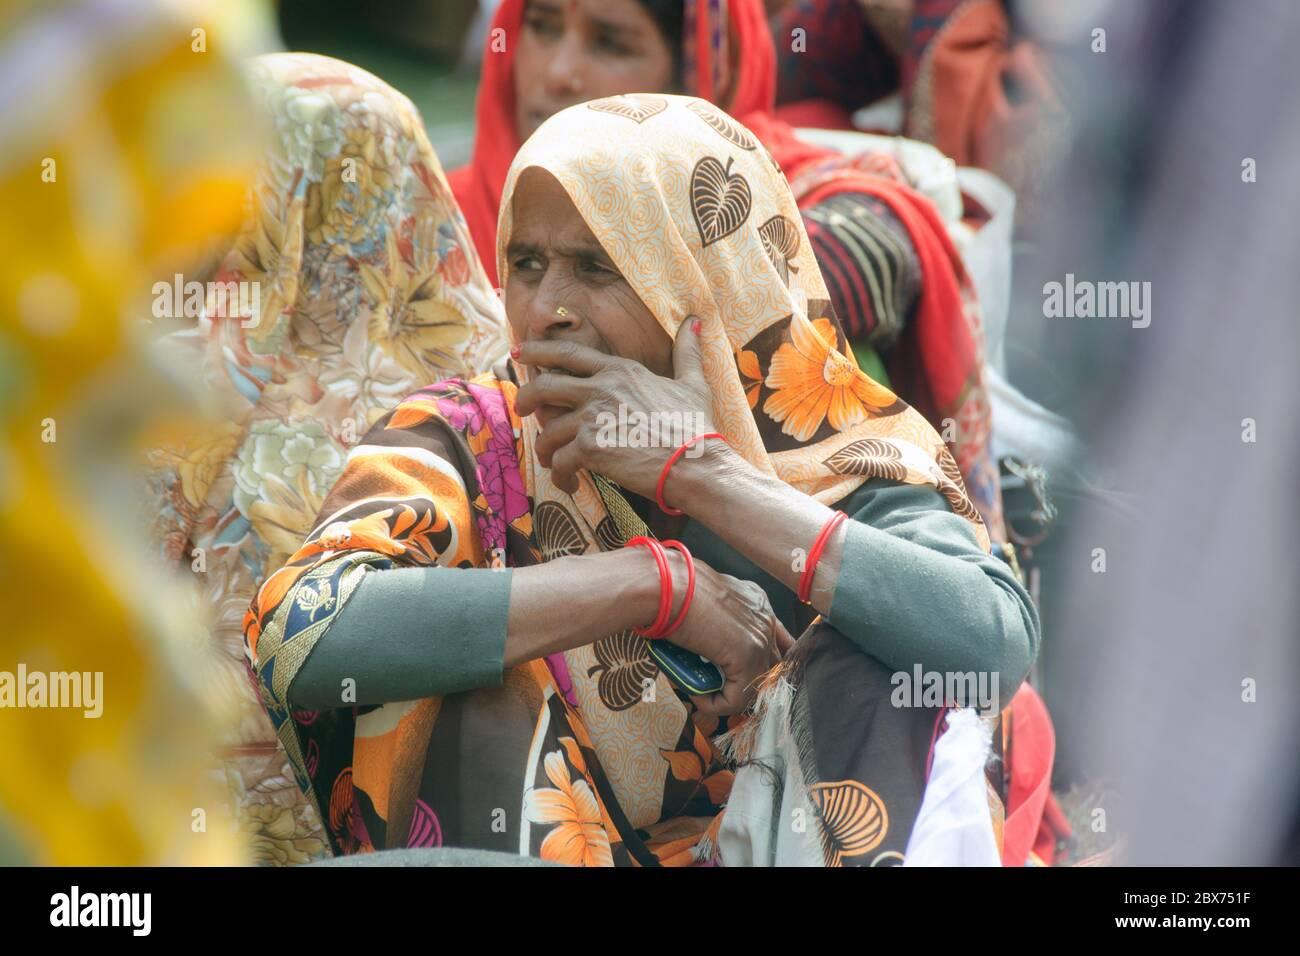 kolkata west bengal india on january 11th 2020: portrait of a pilgrim at gangasagar transit camp kolkata west bengal india Stock Photo